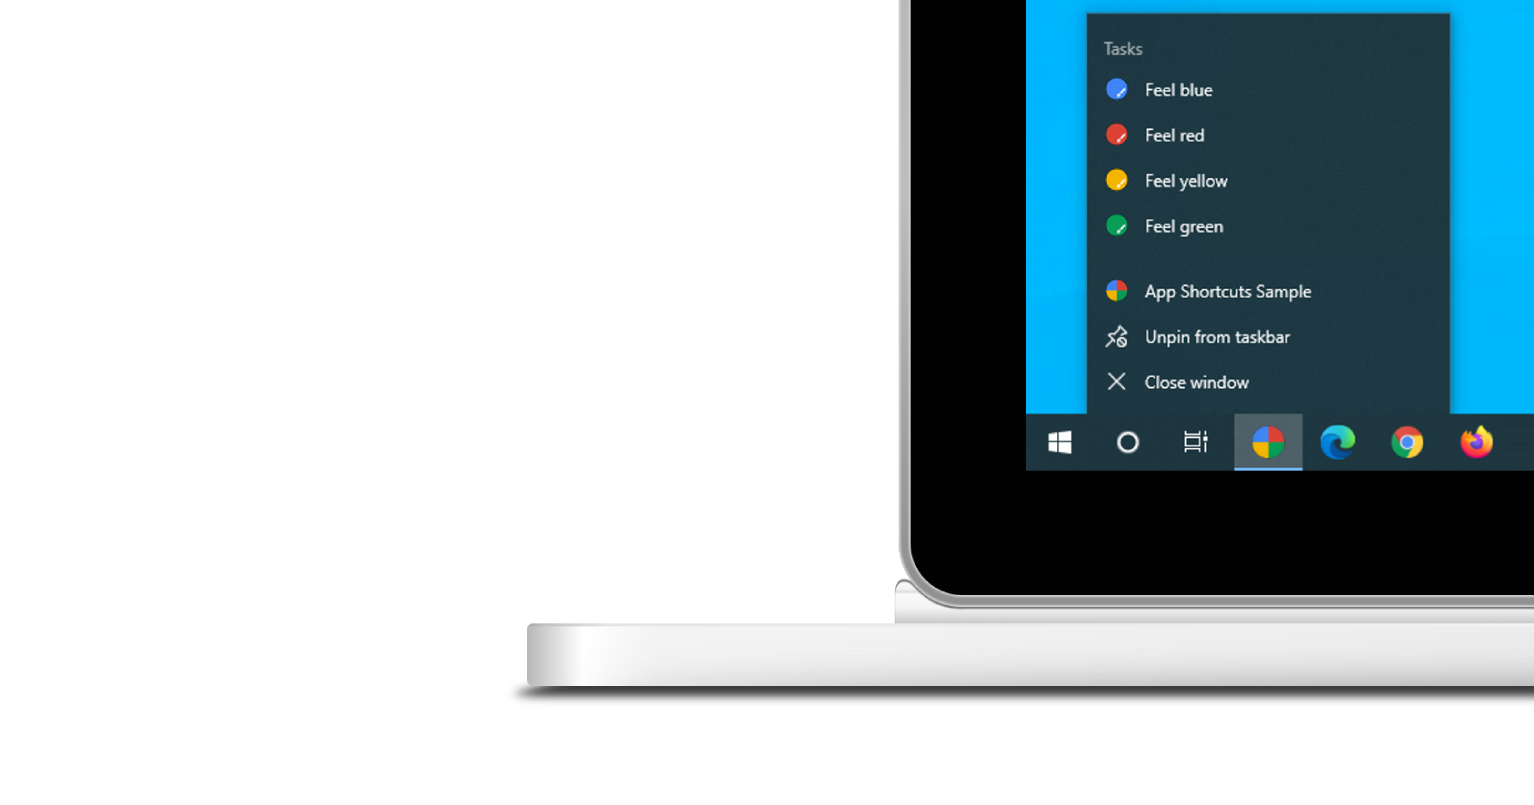 Screenshot of an app shortcuts menu opened on Windows